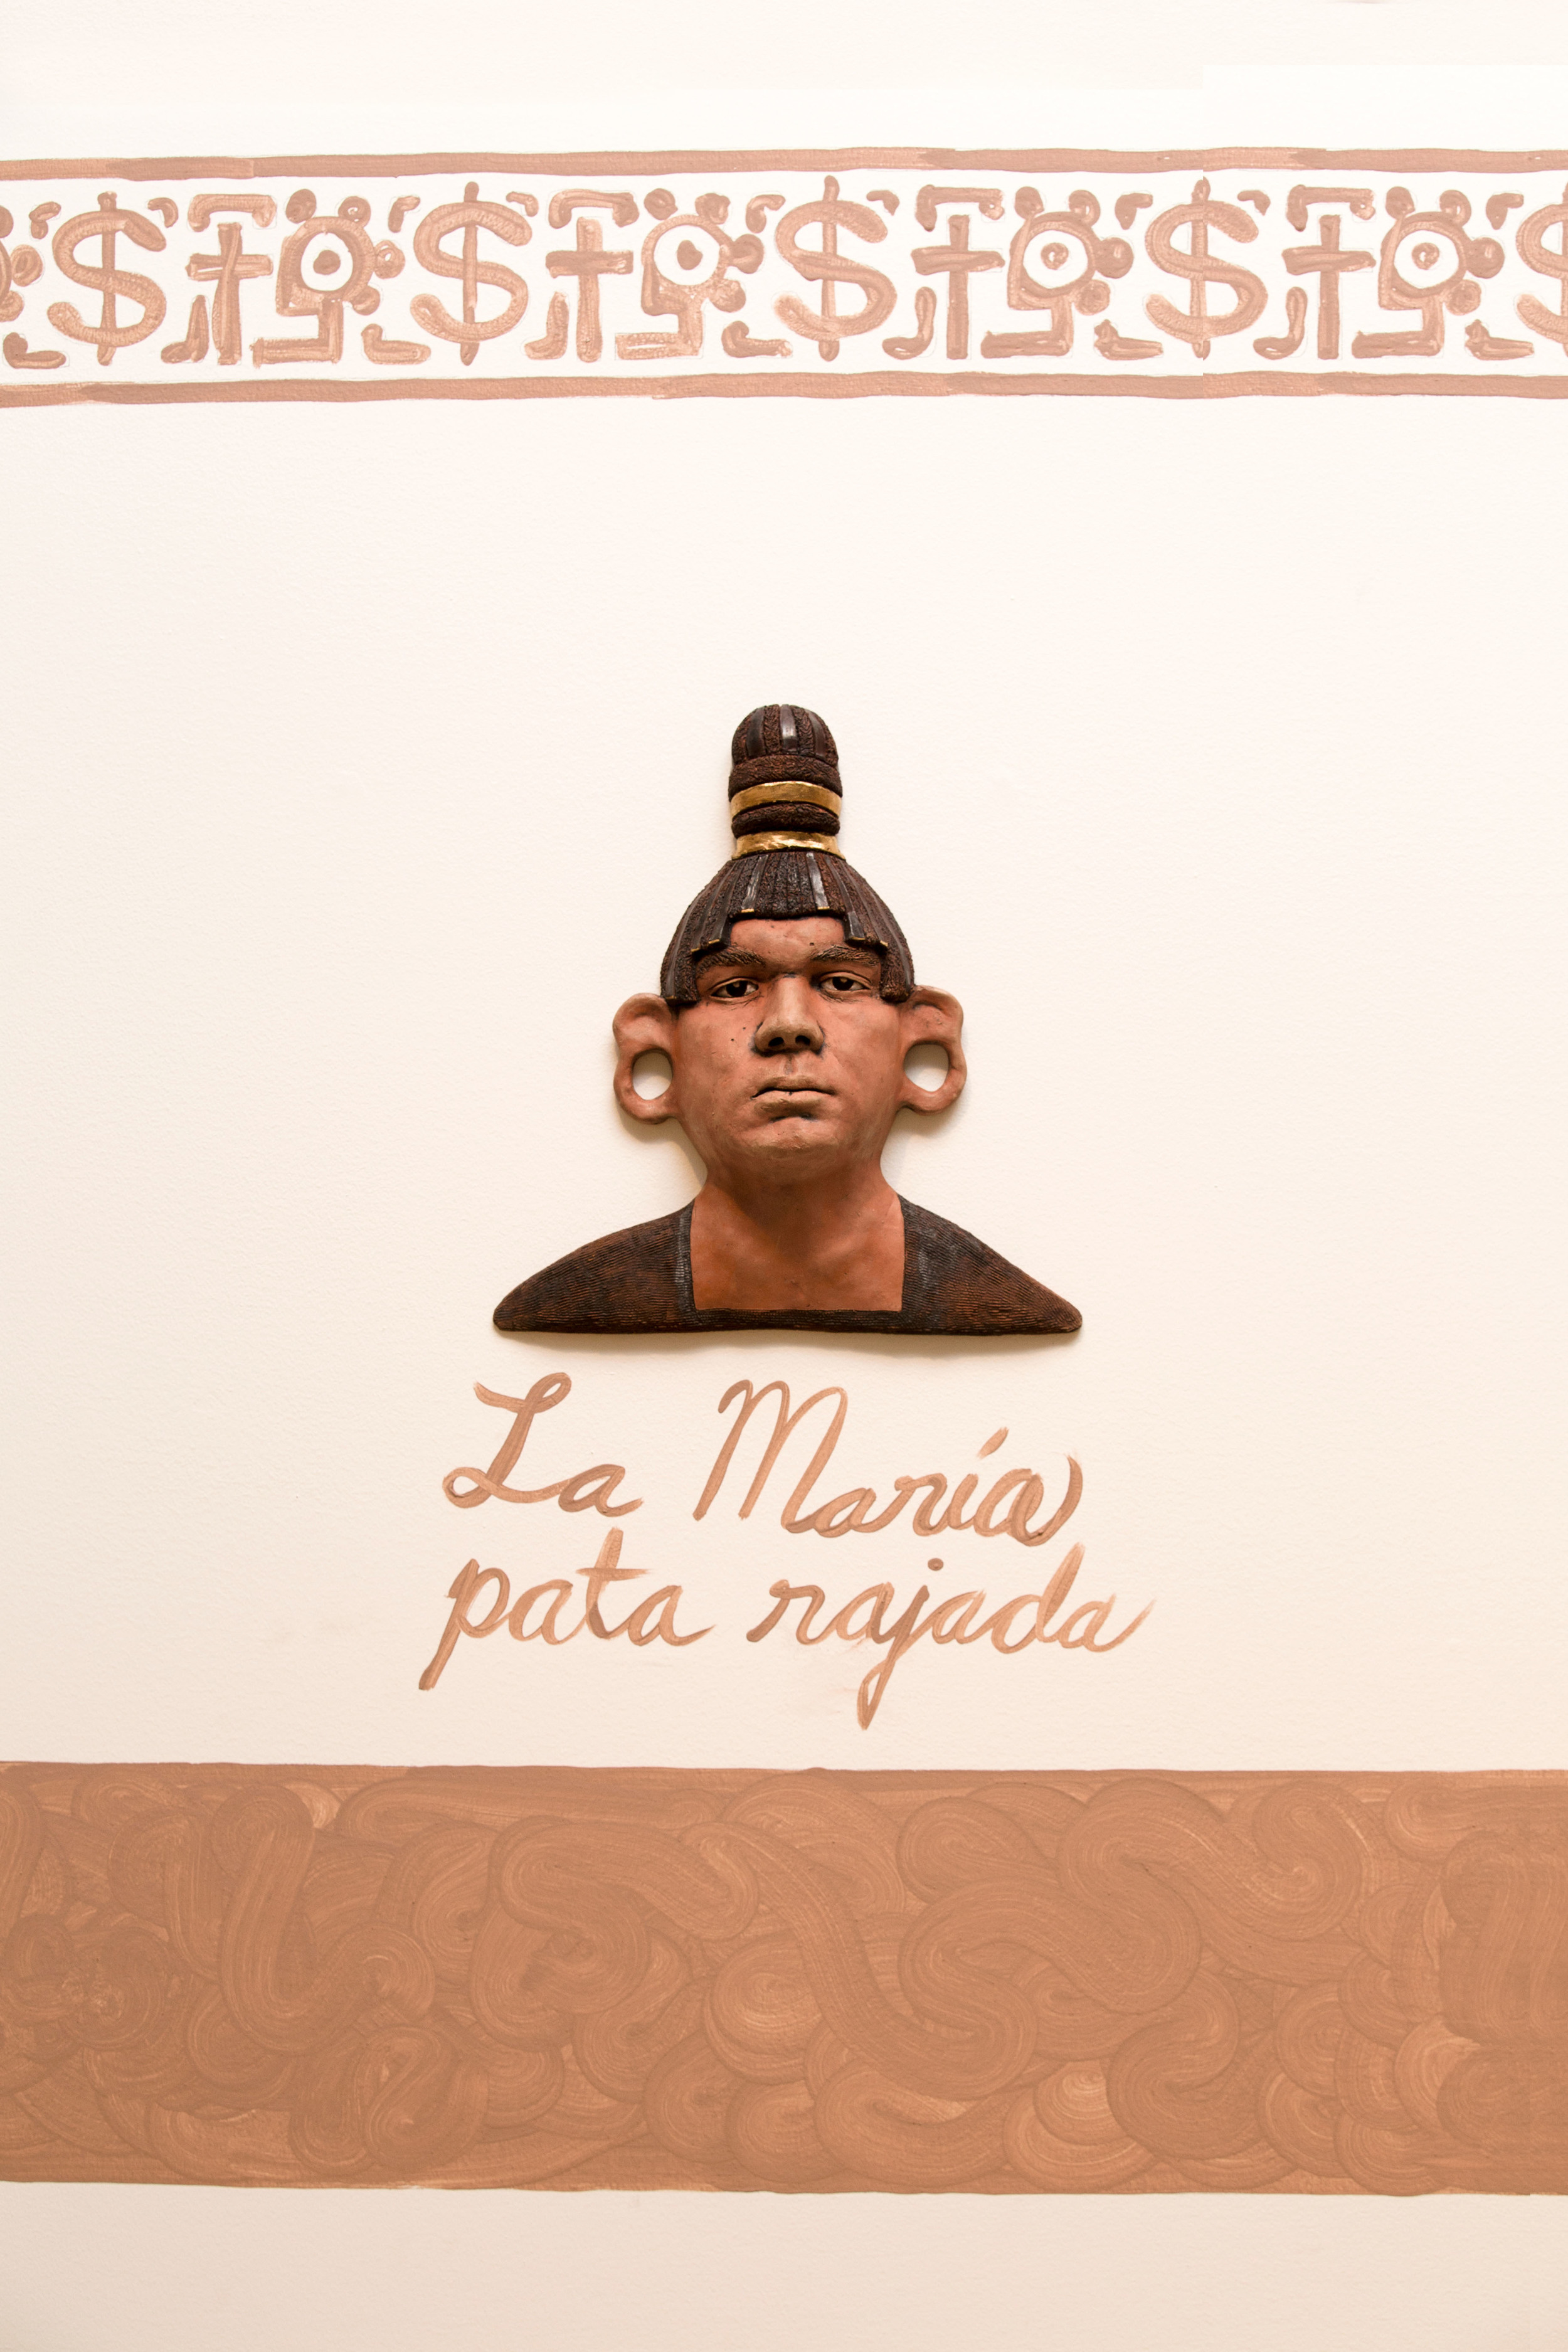 La María pata rajada (Translation Not Available)